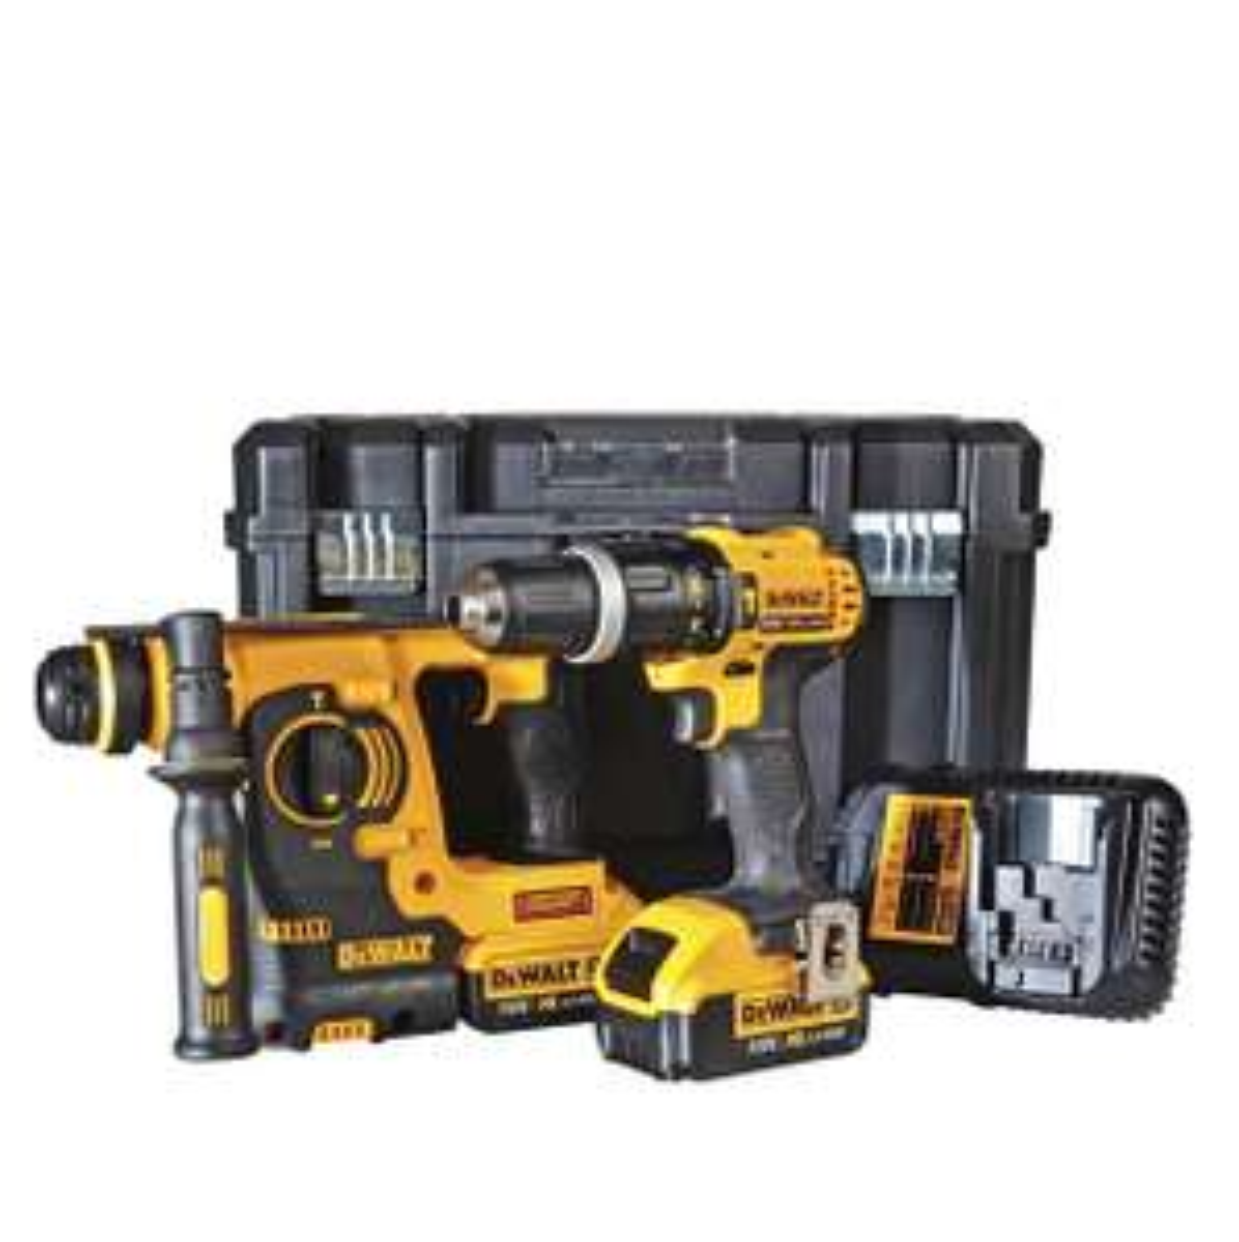 Dewalt Combi Drill & SDS hammer drill £289.99 @ Amazon